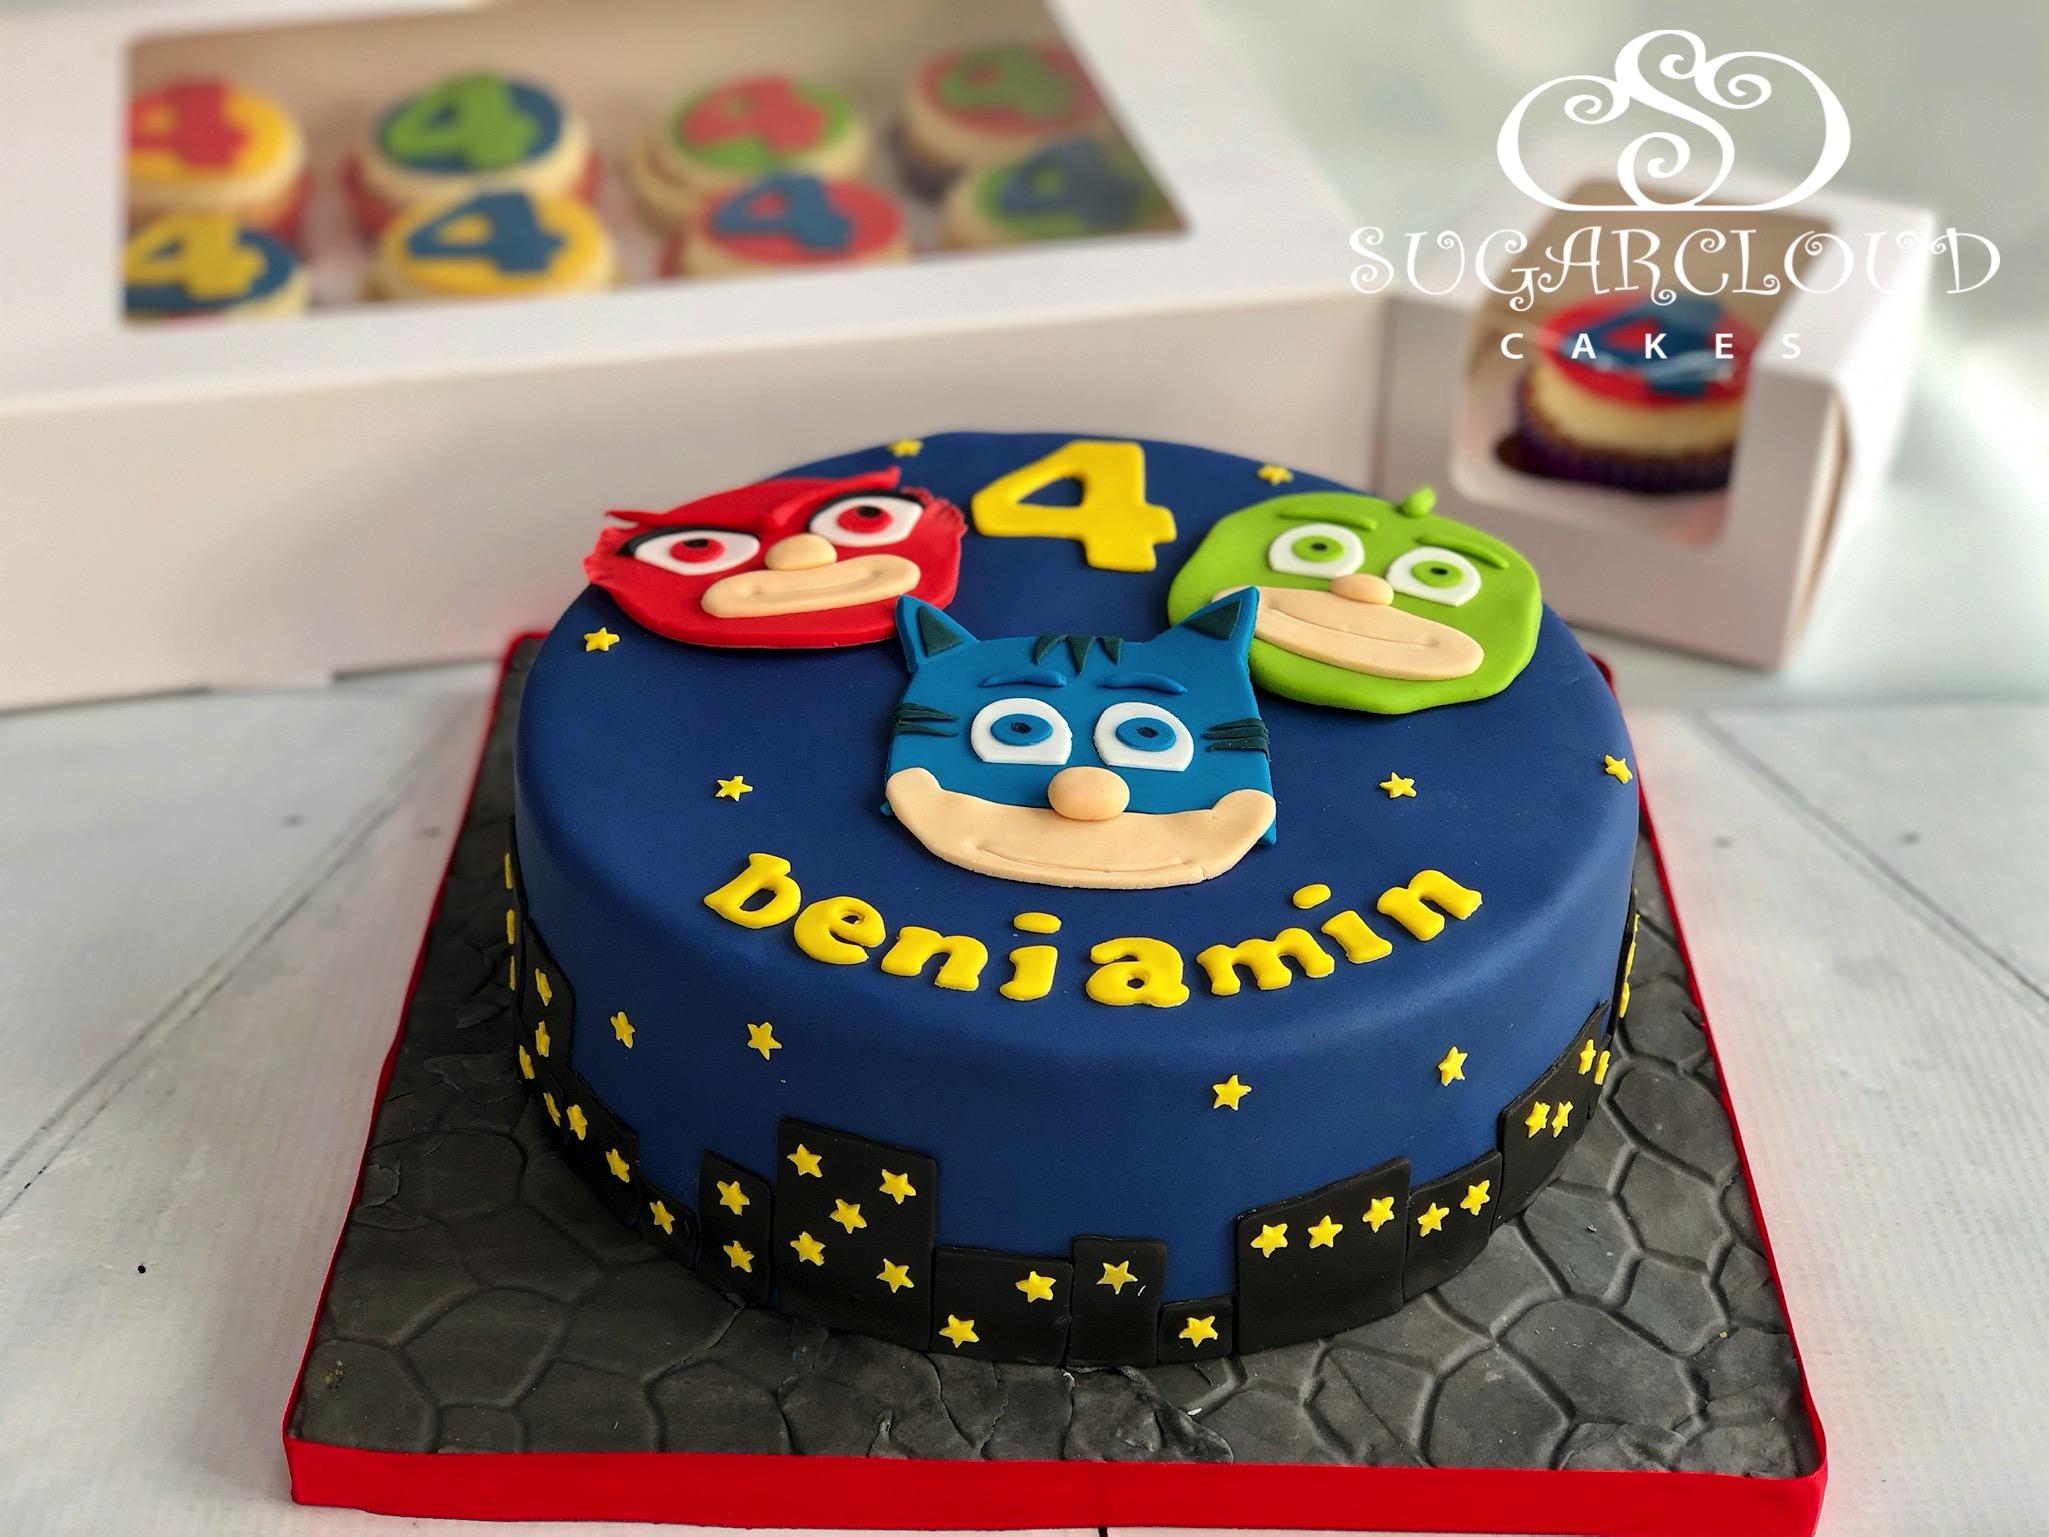 Benjamin's PJ Masks Inspired Cake and Cupcakes